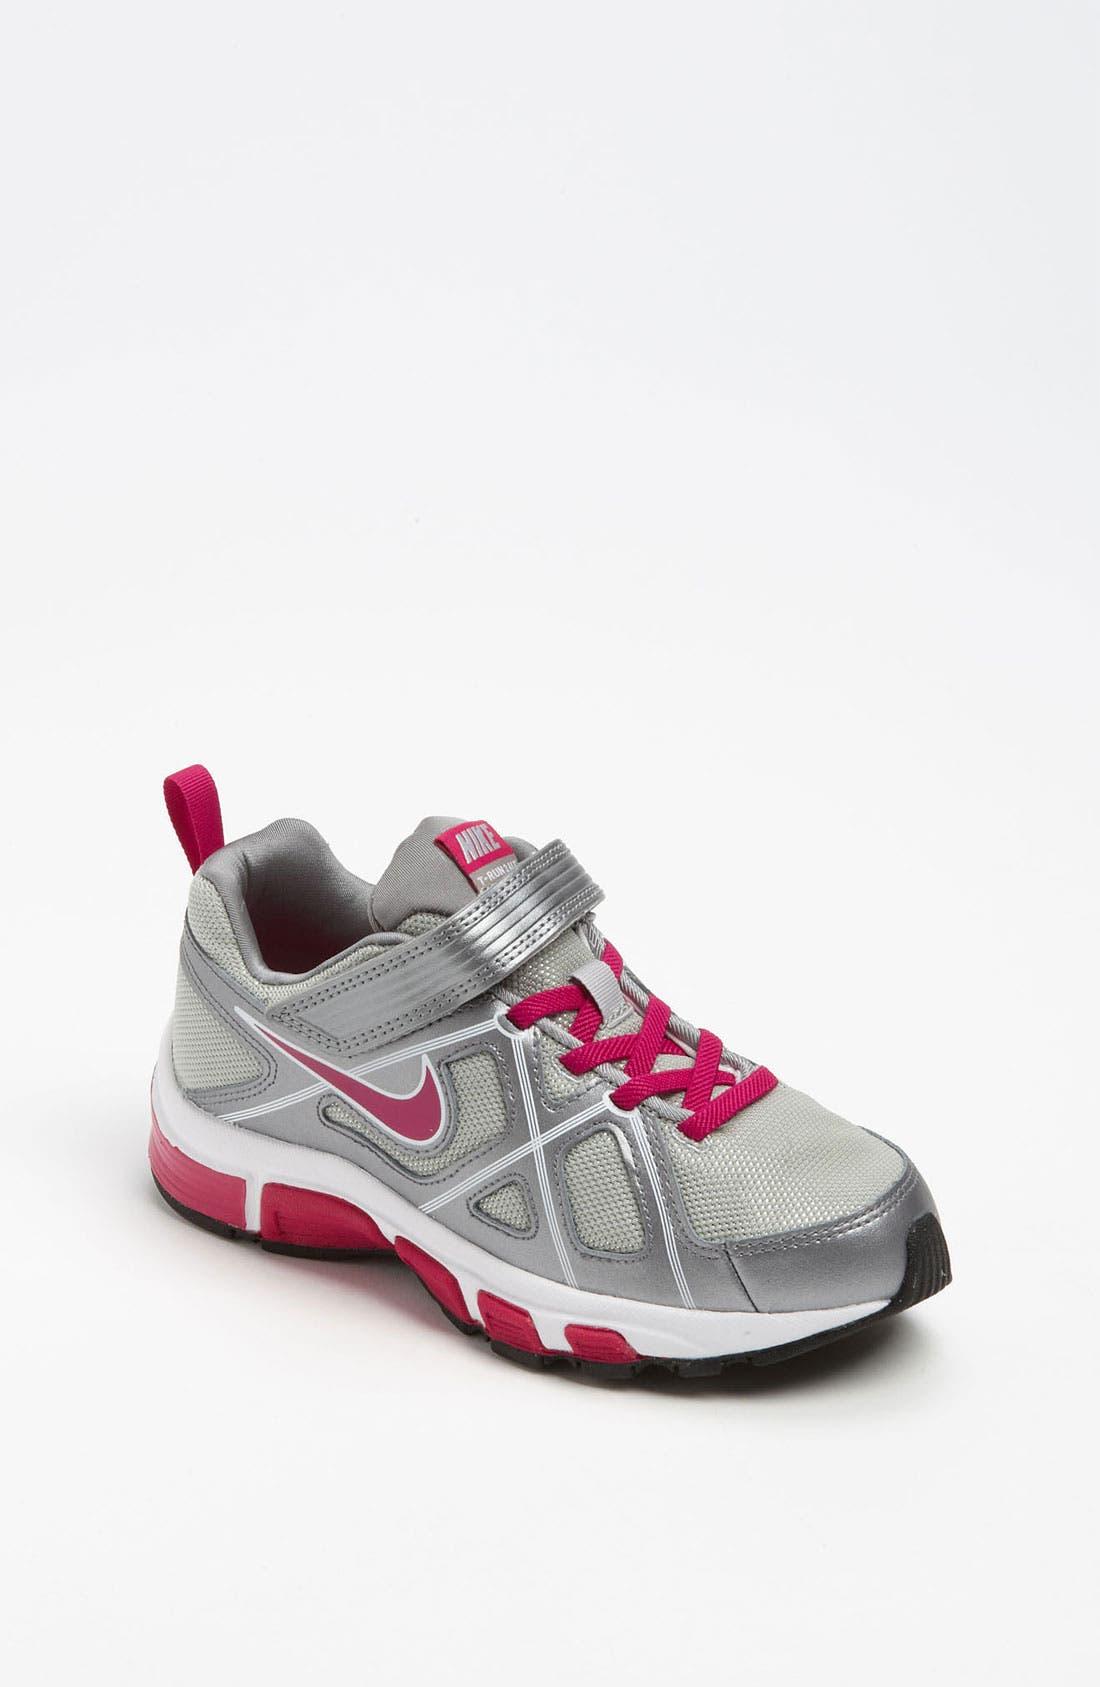 Main Image - Nike 'T-Run 3 Alt' Running Shoe (Toddler, Little Kid & Big Kid) (Special Purchase)